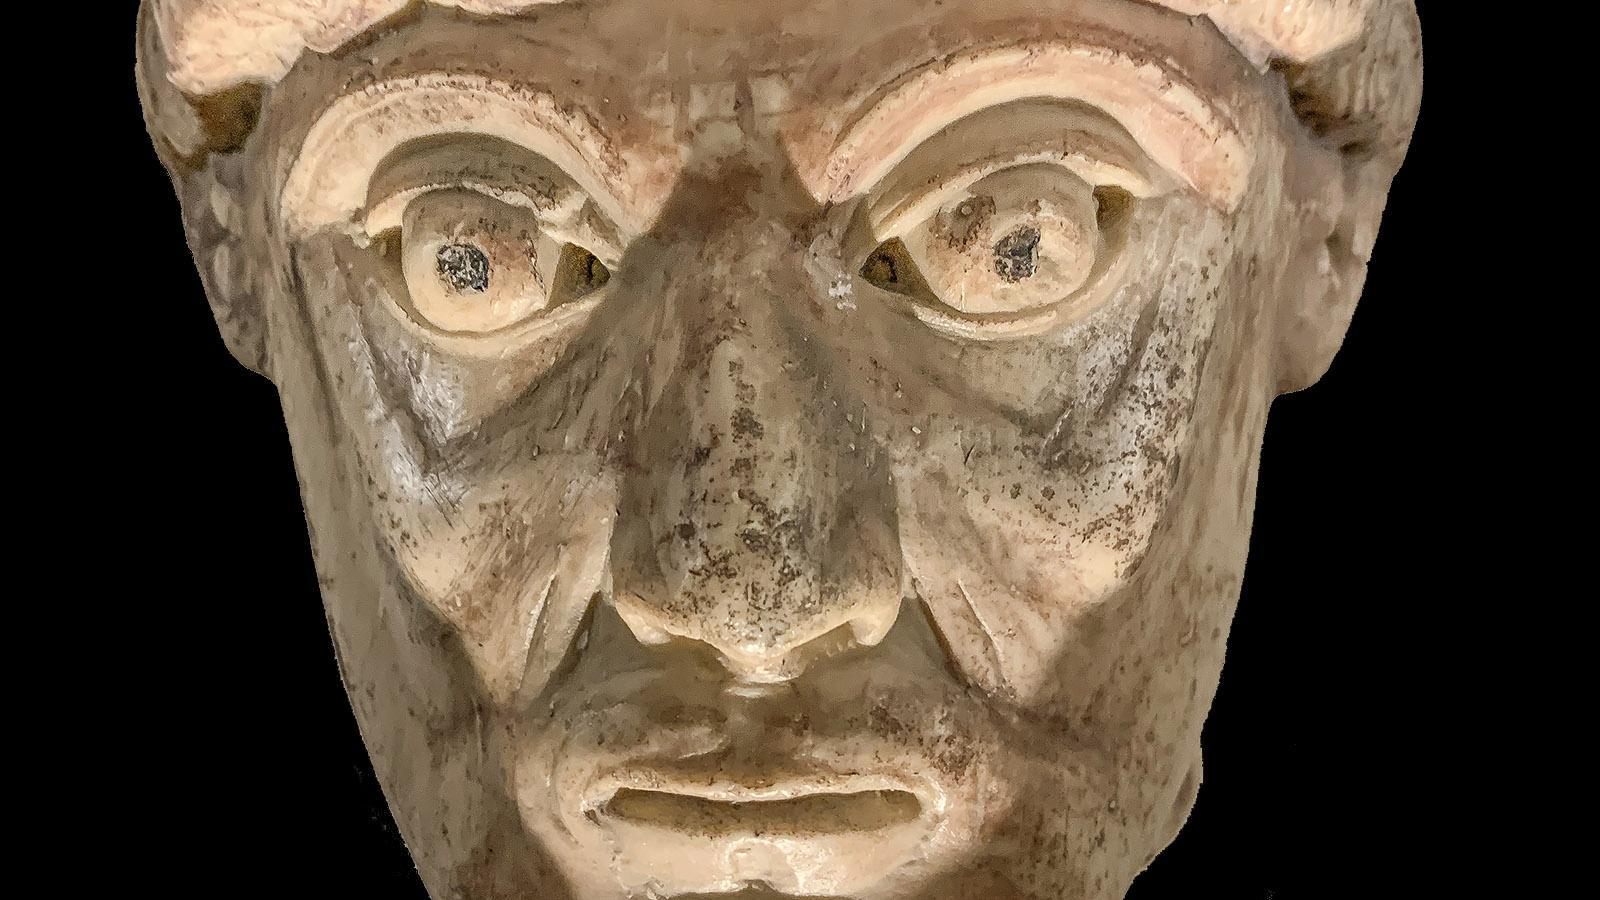 Maître de Cabestany: Der Kopf verrät. Früher waren die Skulpturen farbig bemalt. Foto: Hilke Maunder